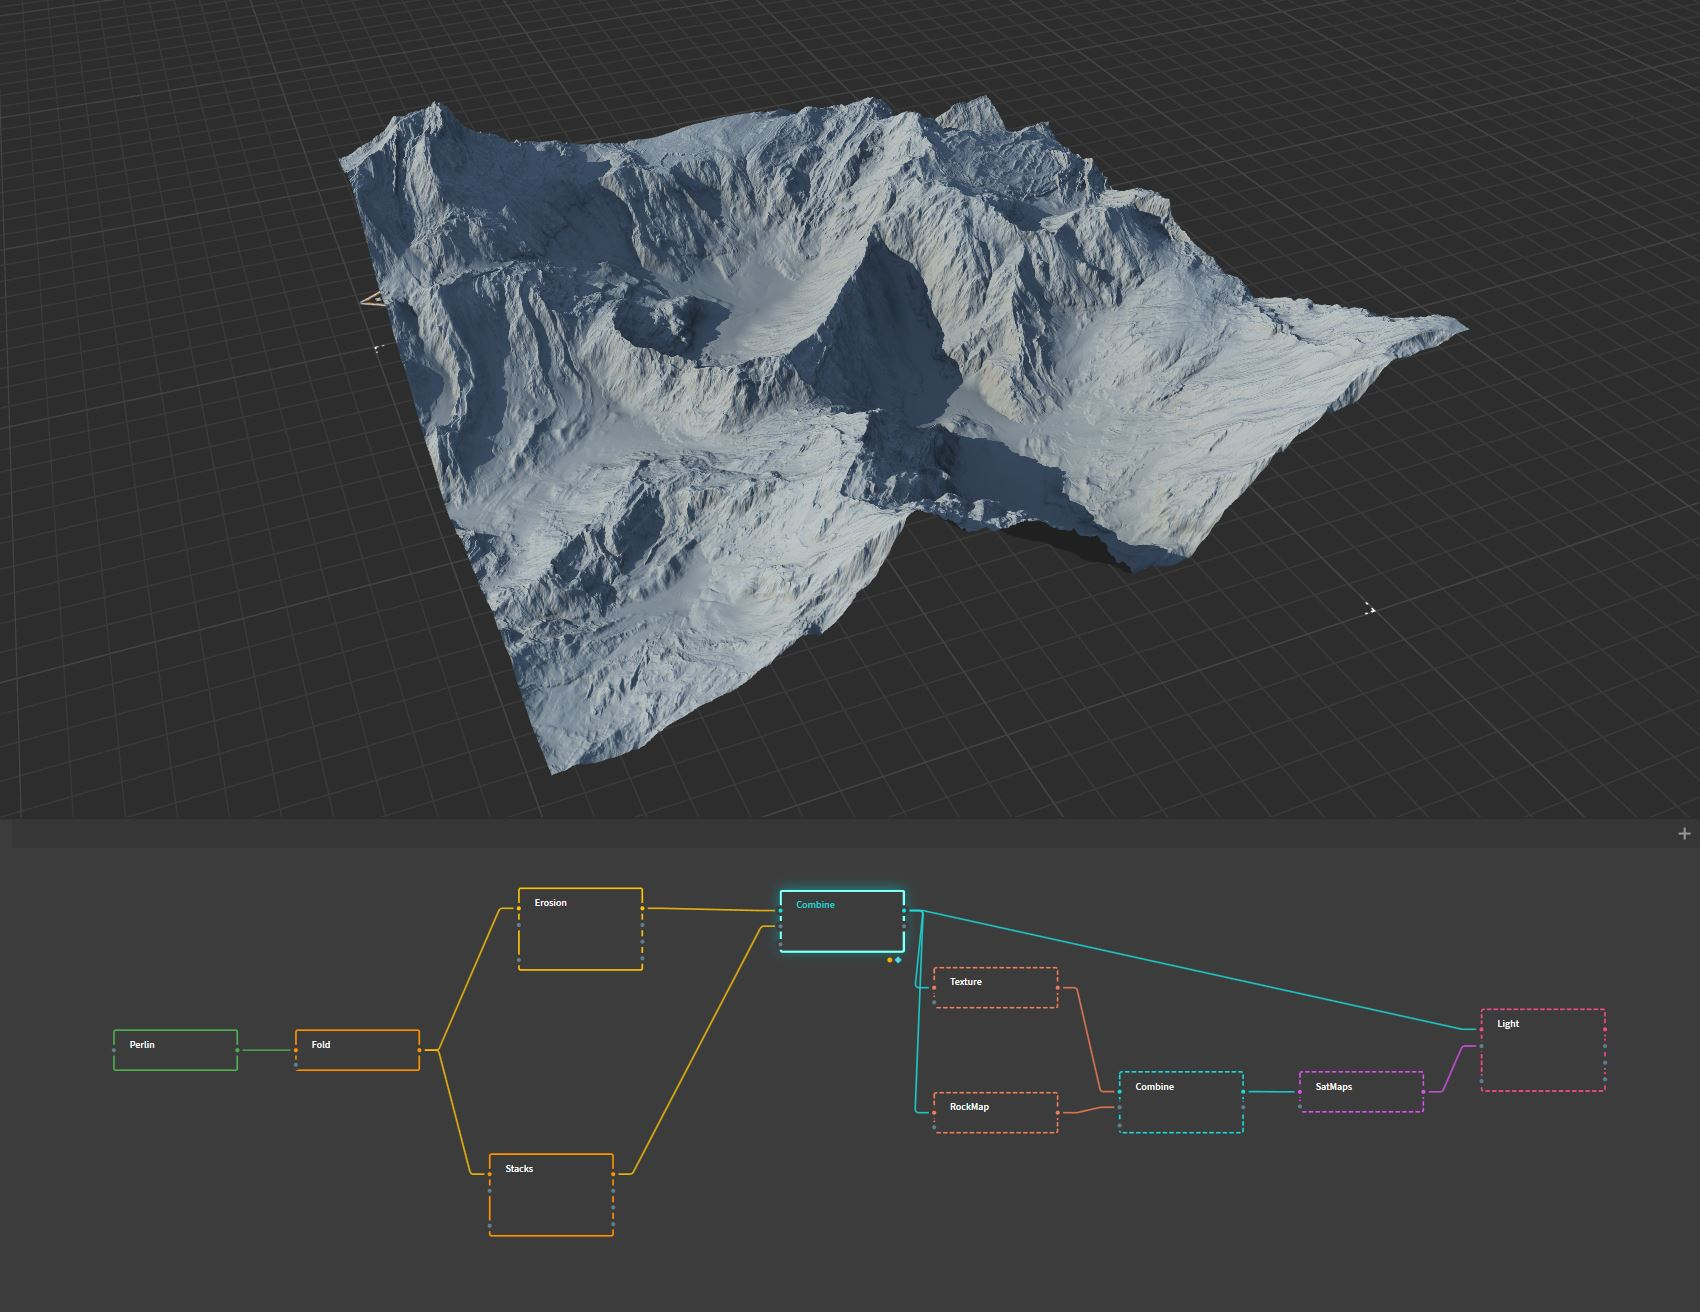 Quadspinner Gaea Screenshot - simulating slopes and geological transformations